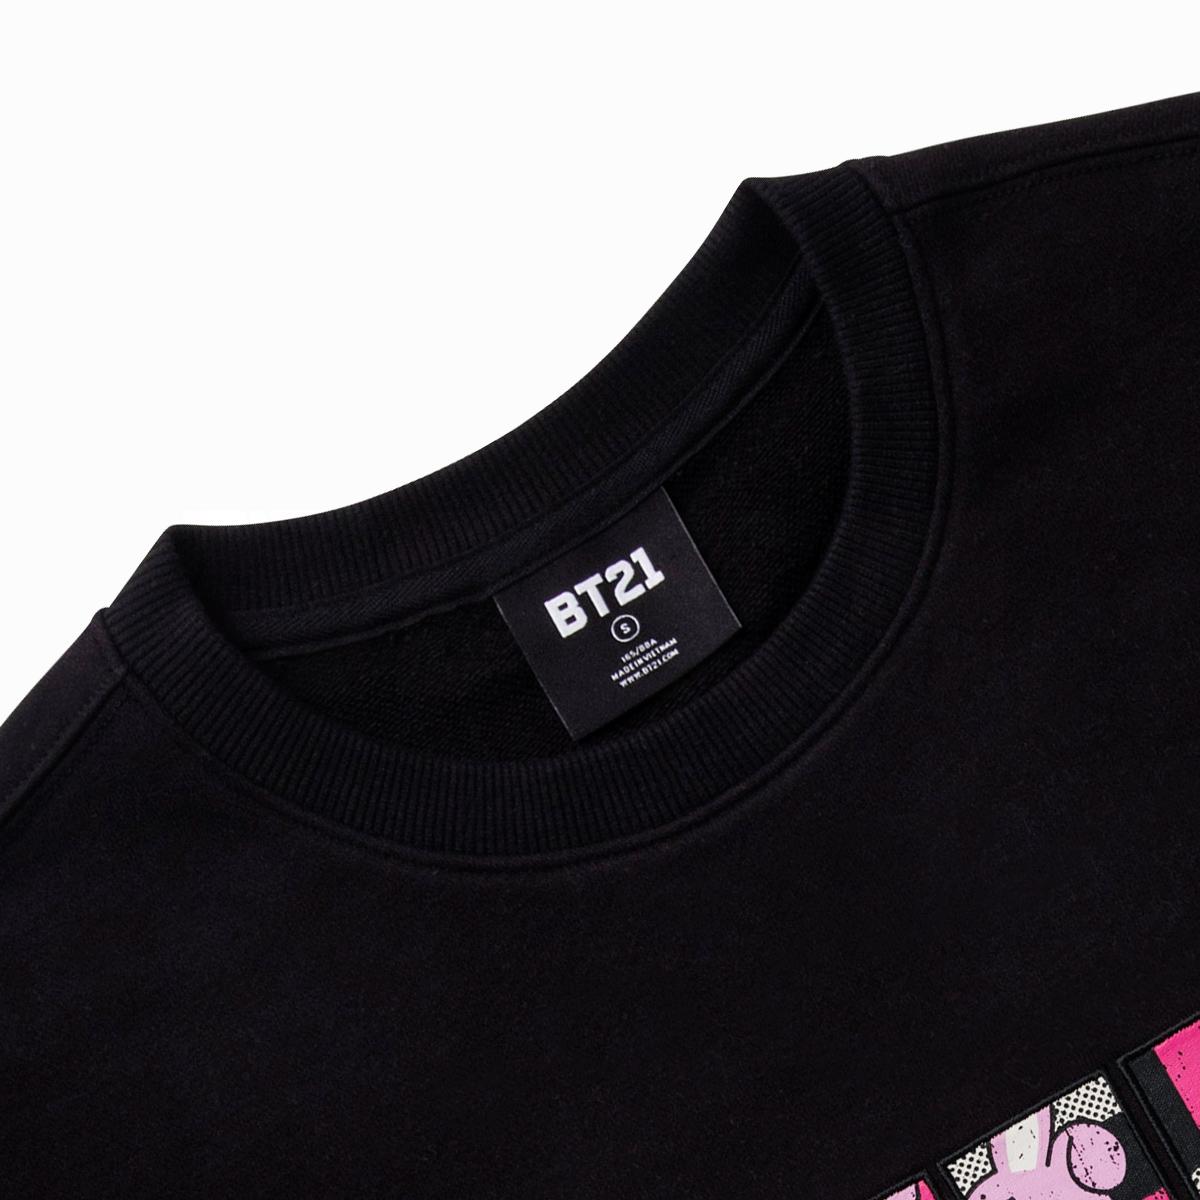 BT21 COOKY 코믹팝 스웻셔츠